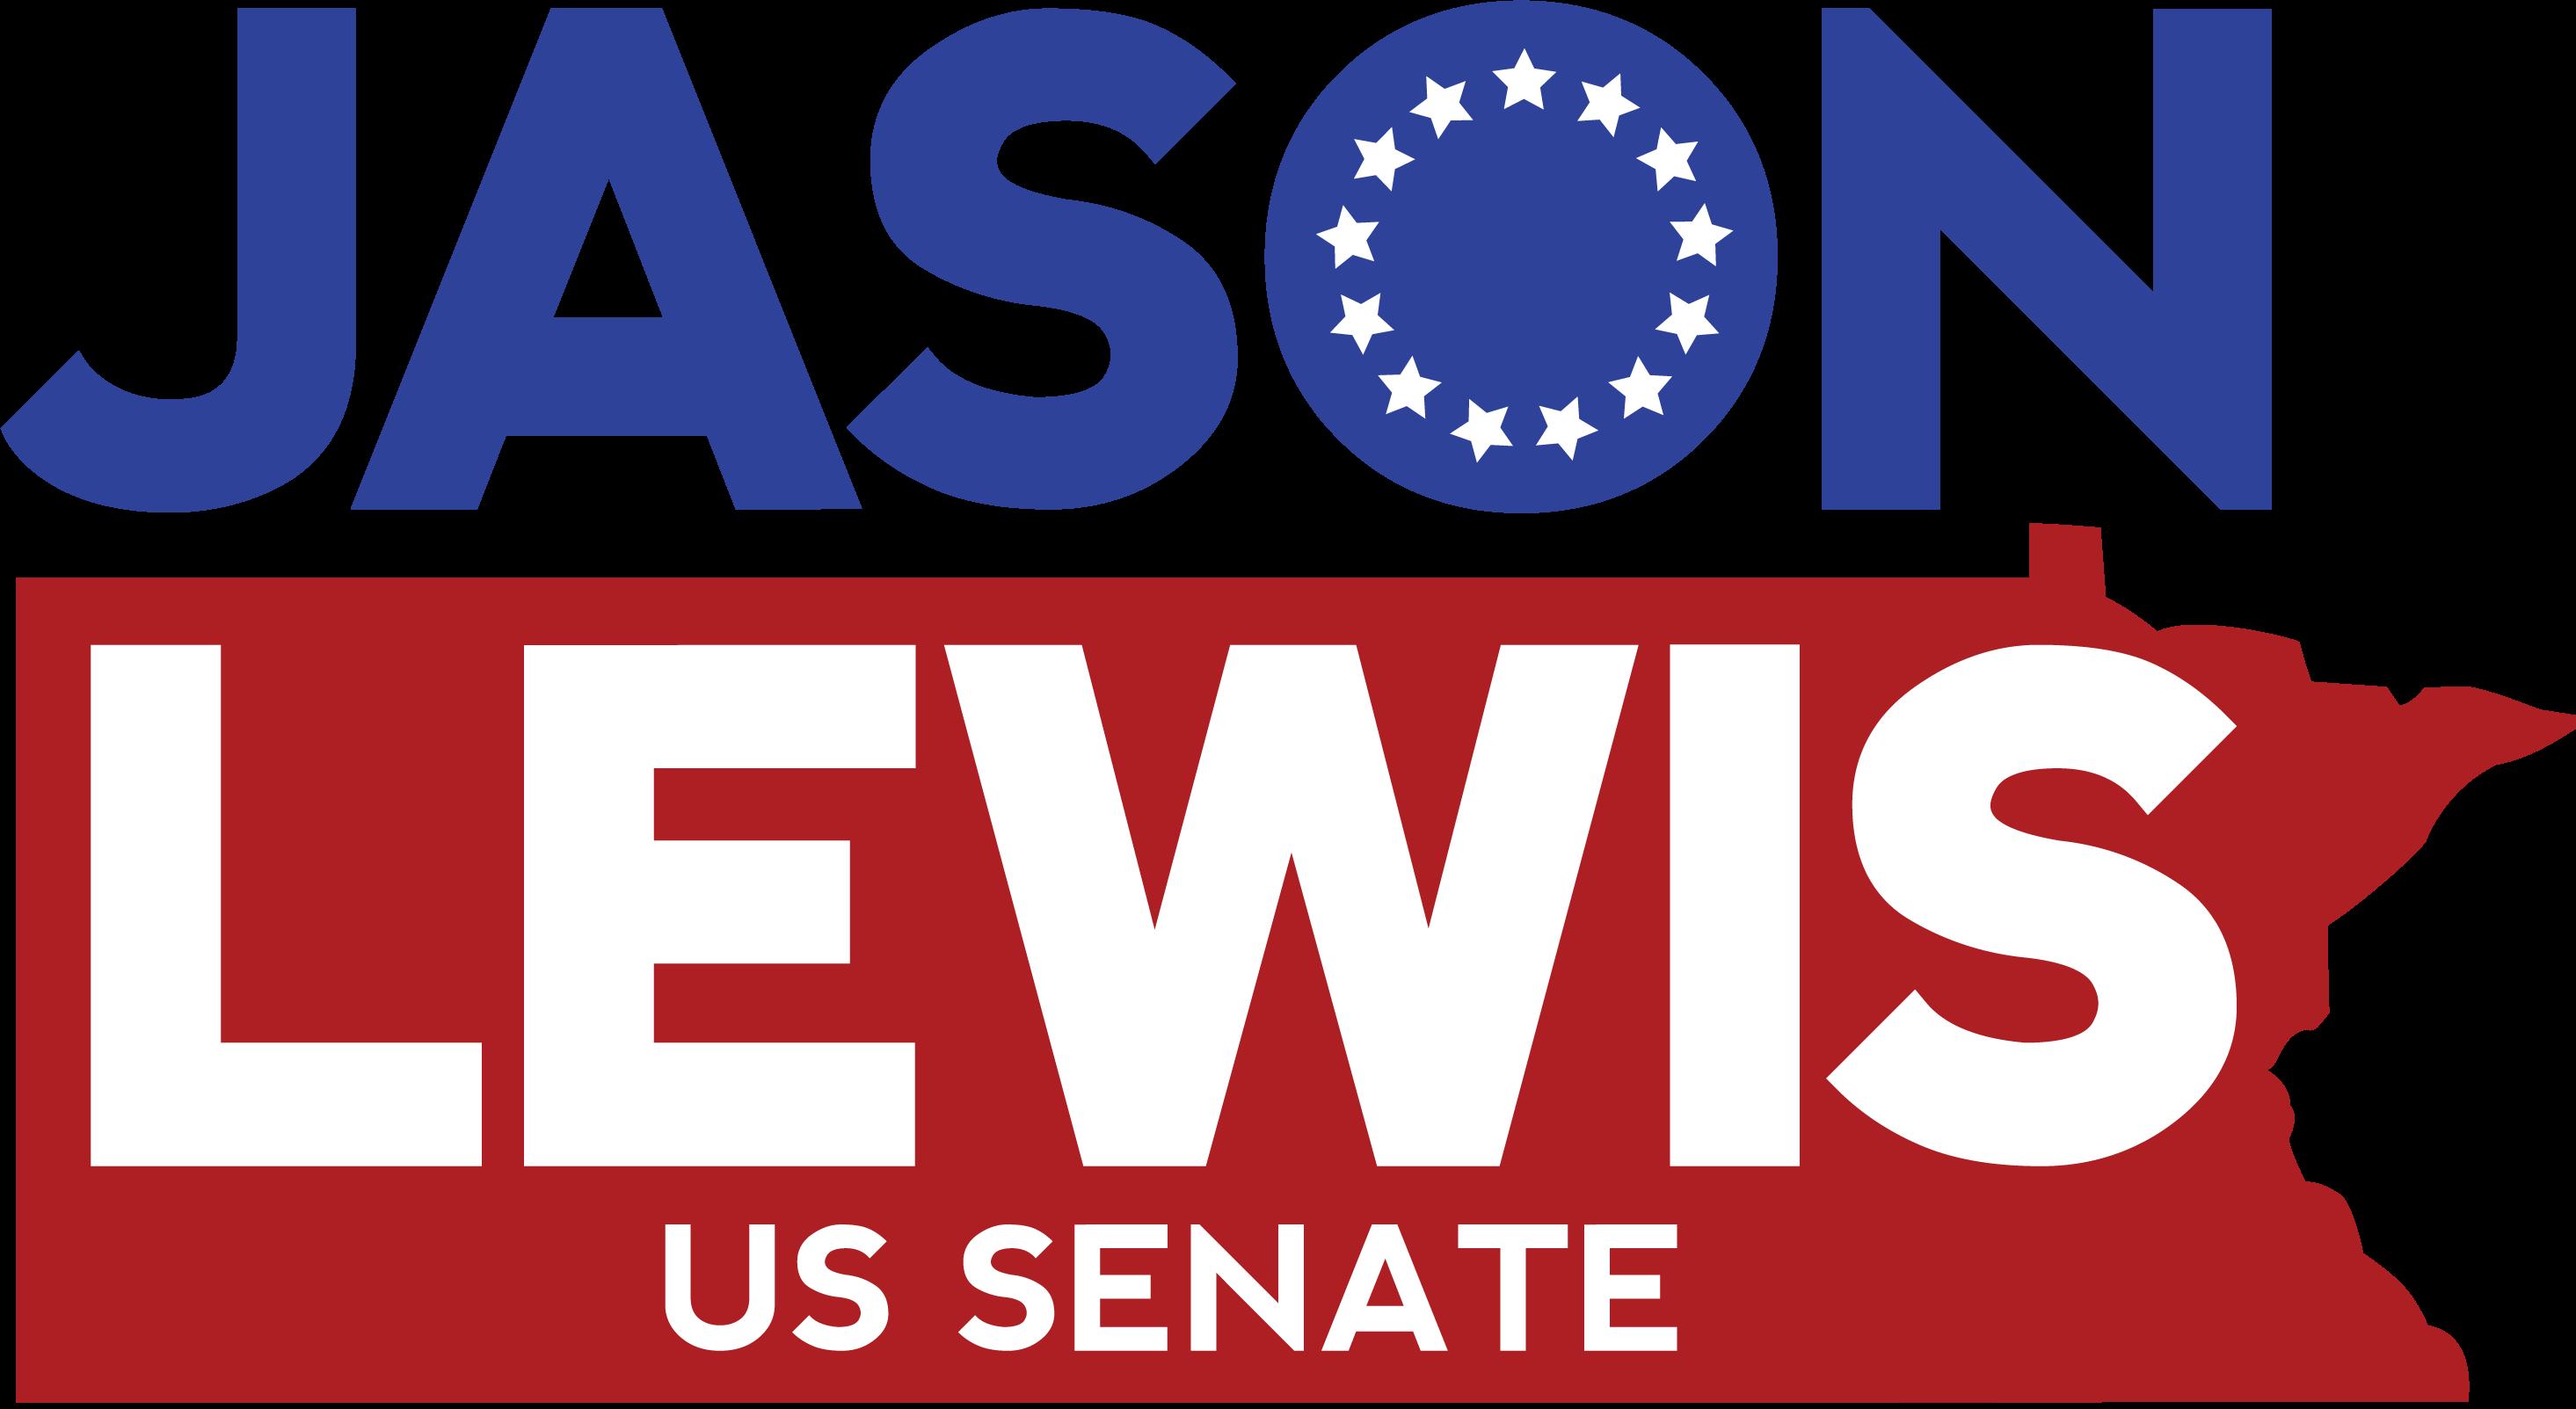 Jason Lewis for Senate